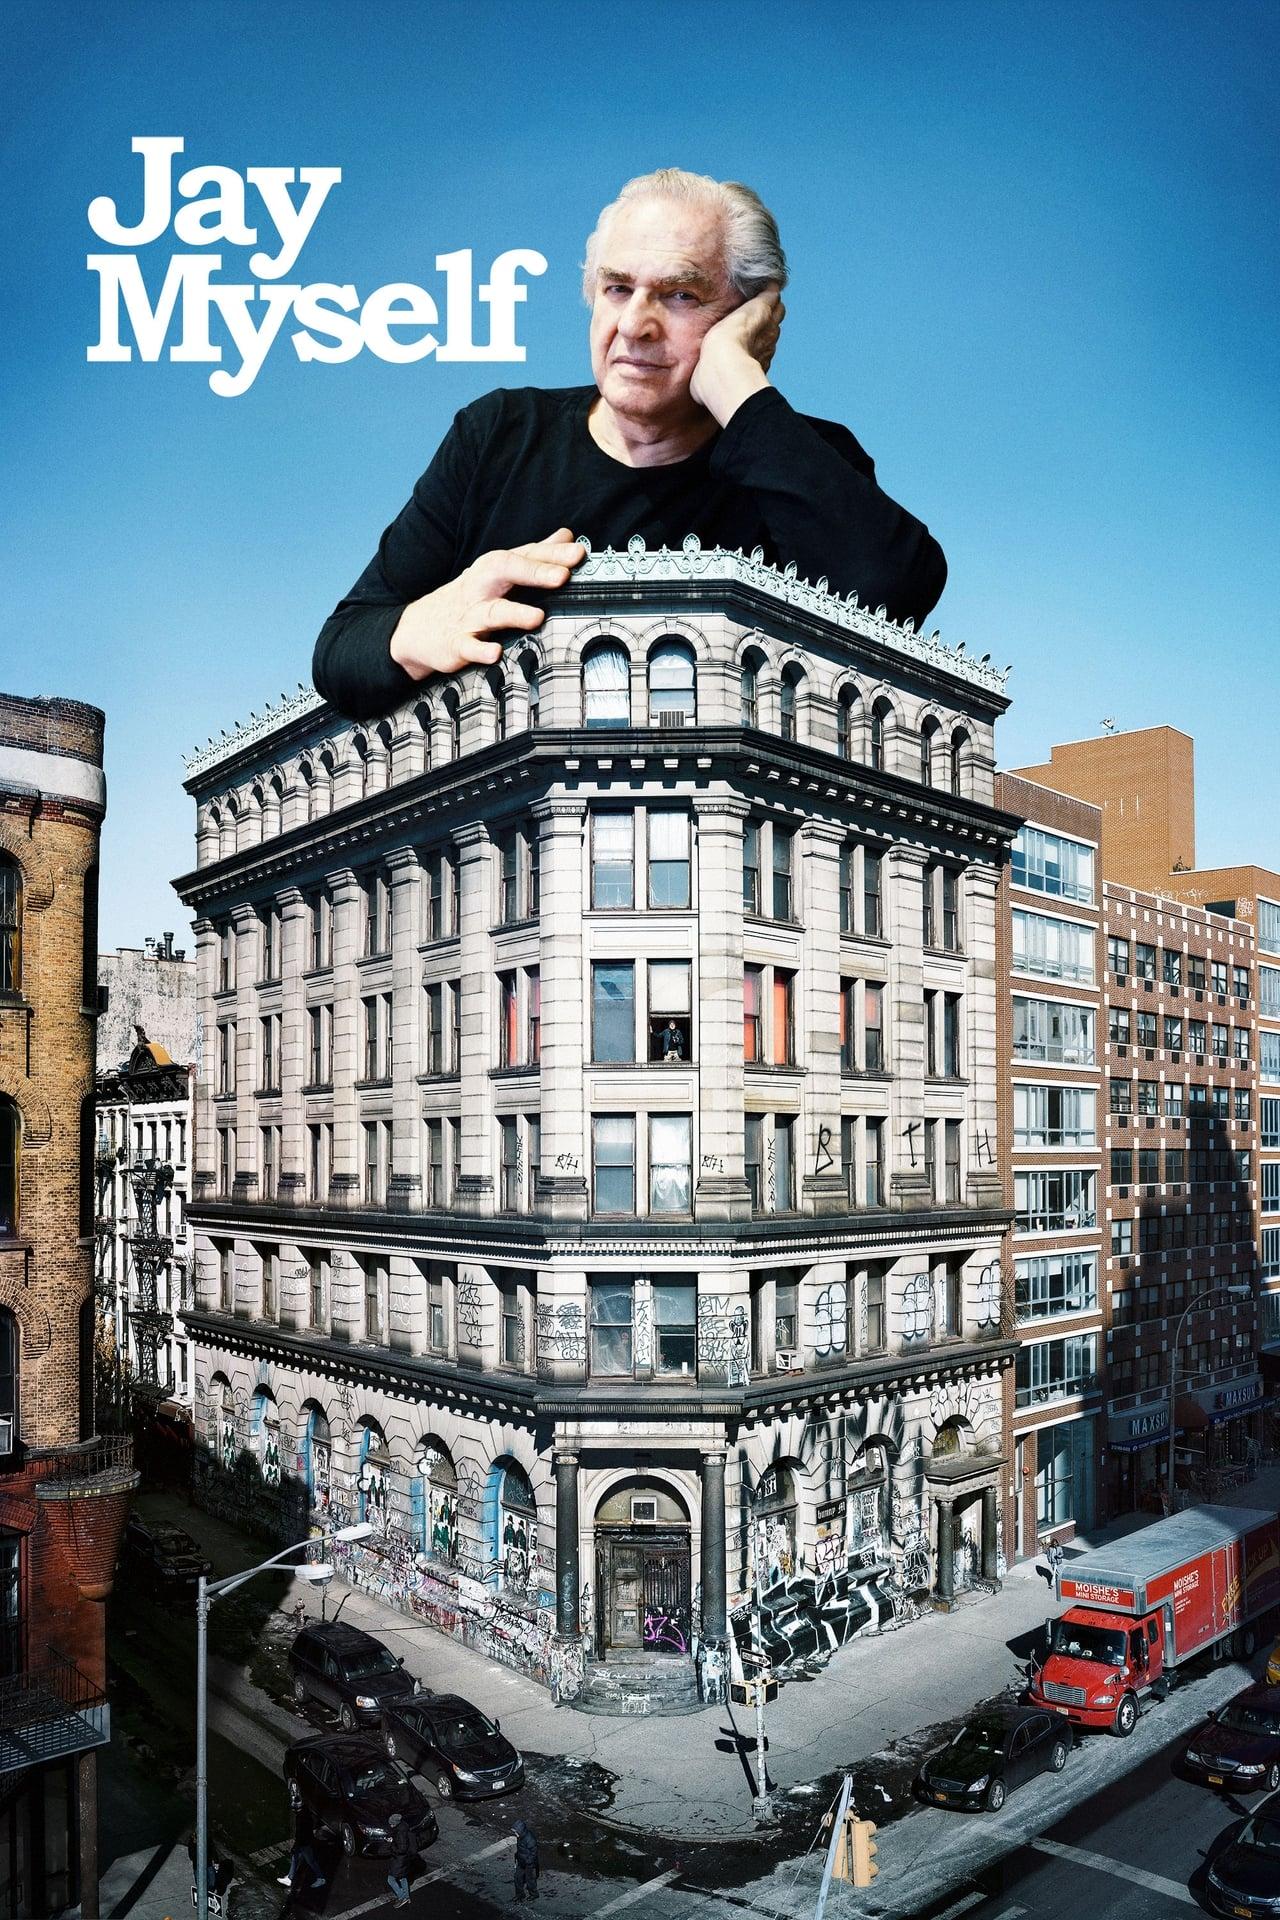 Jay Myself poster